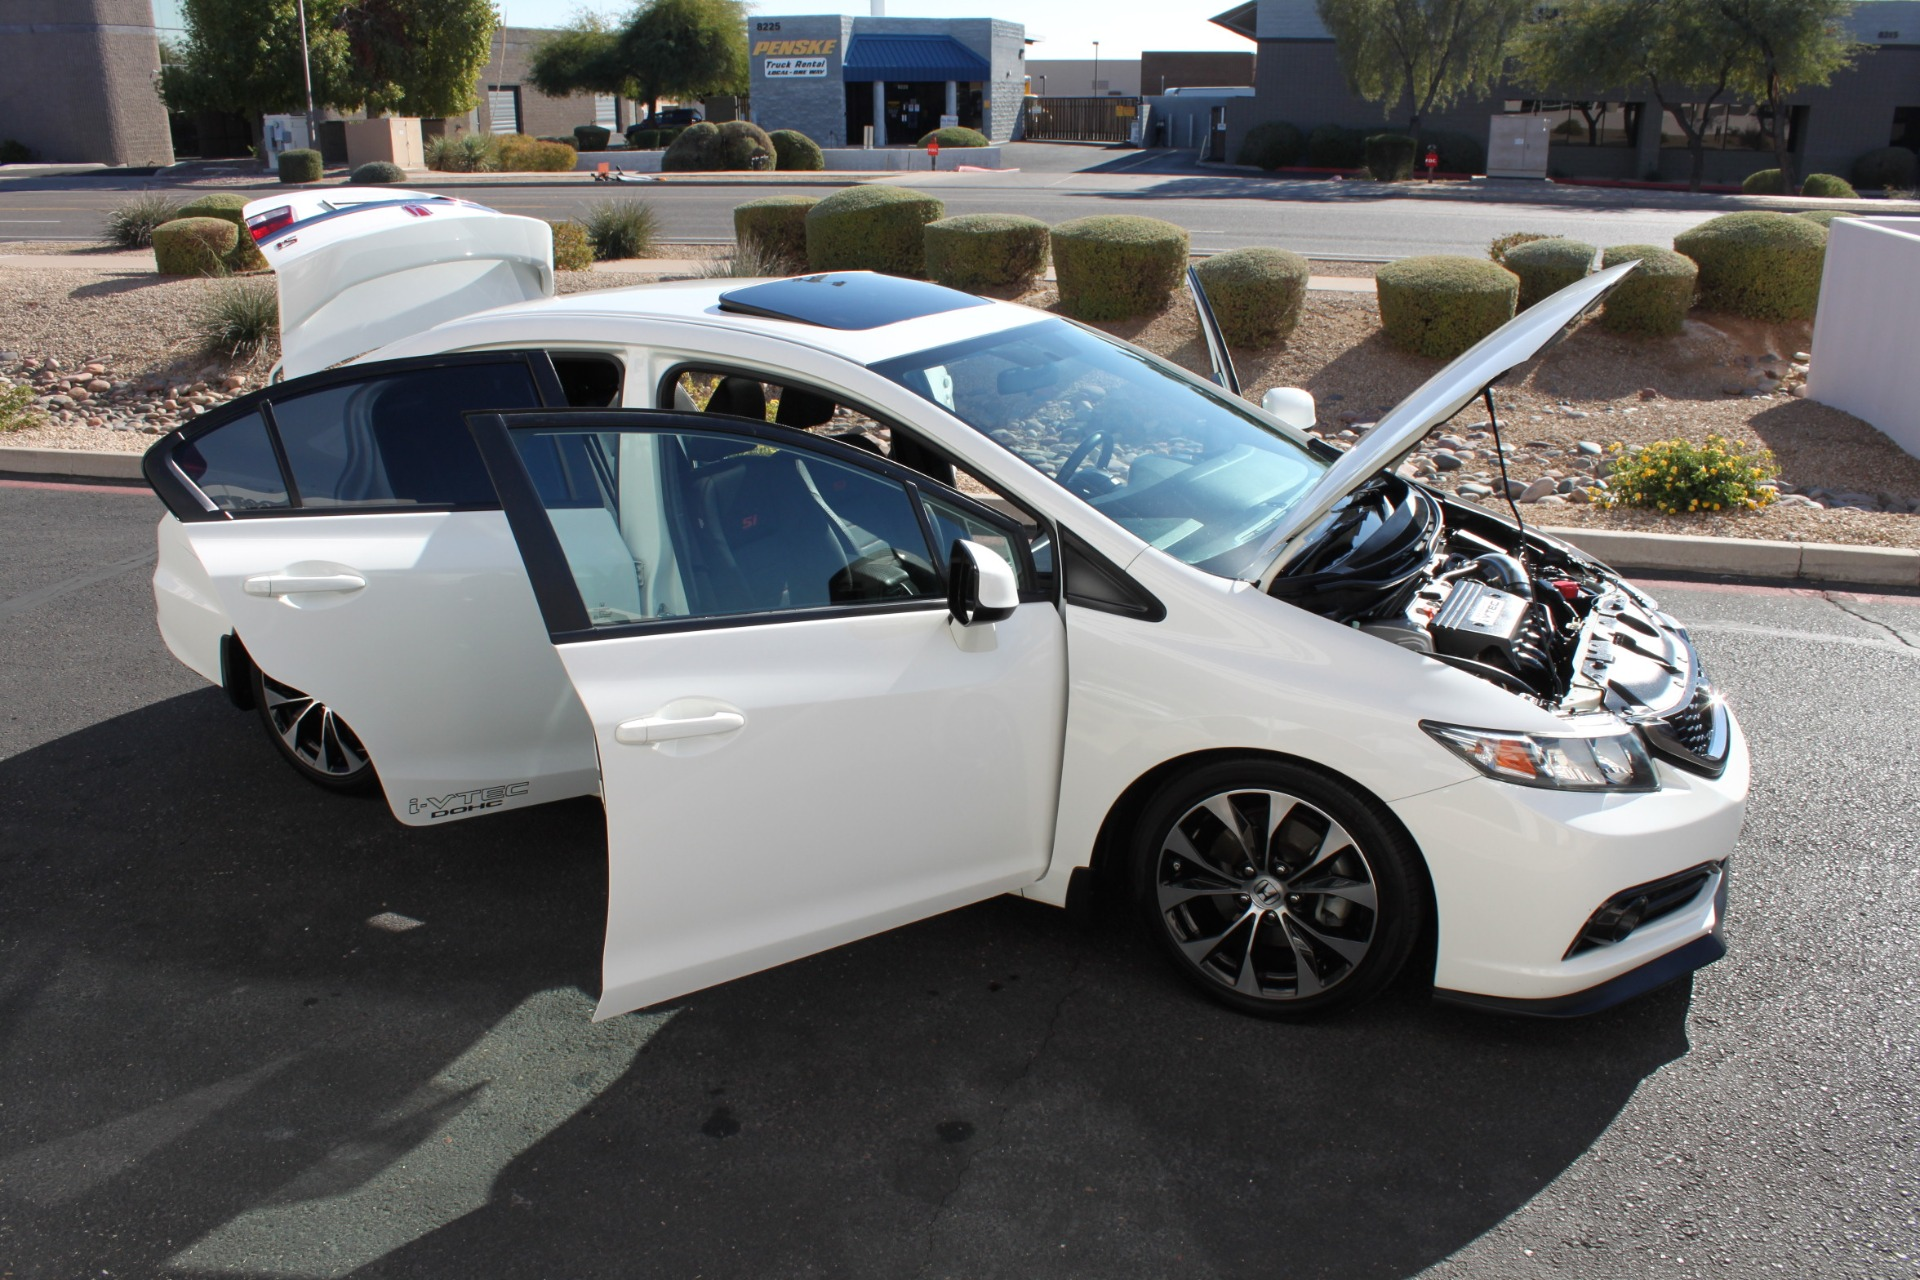 Used-2013-Honda-Civic-Sedan-Si-Mini